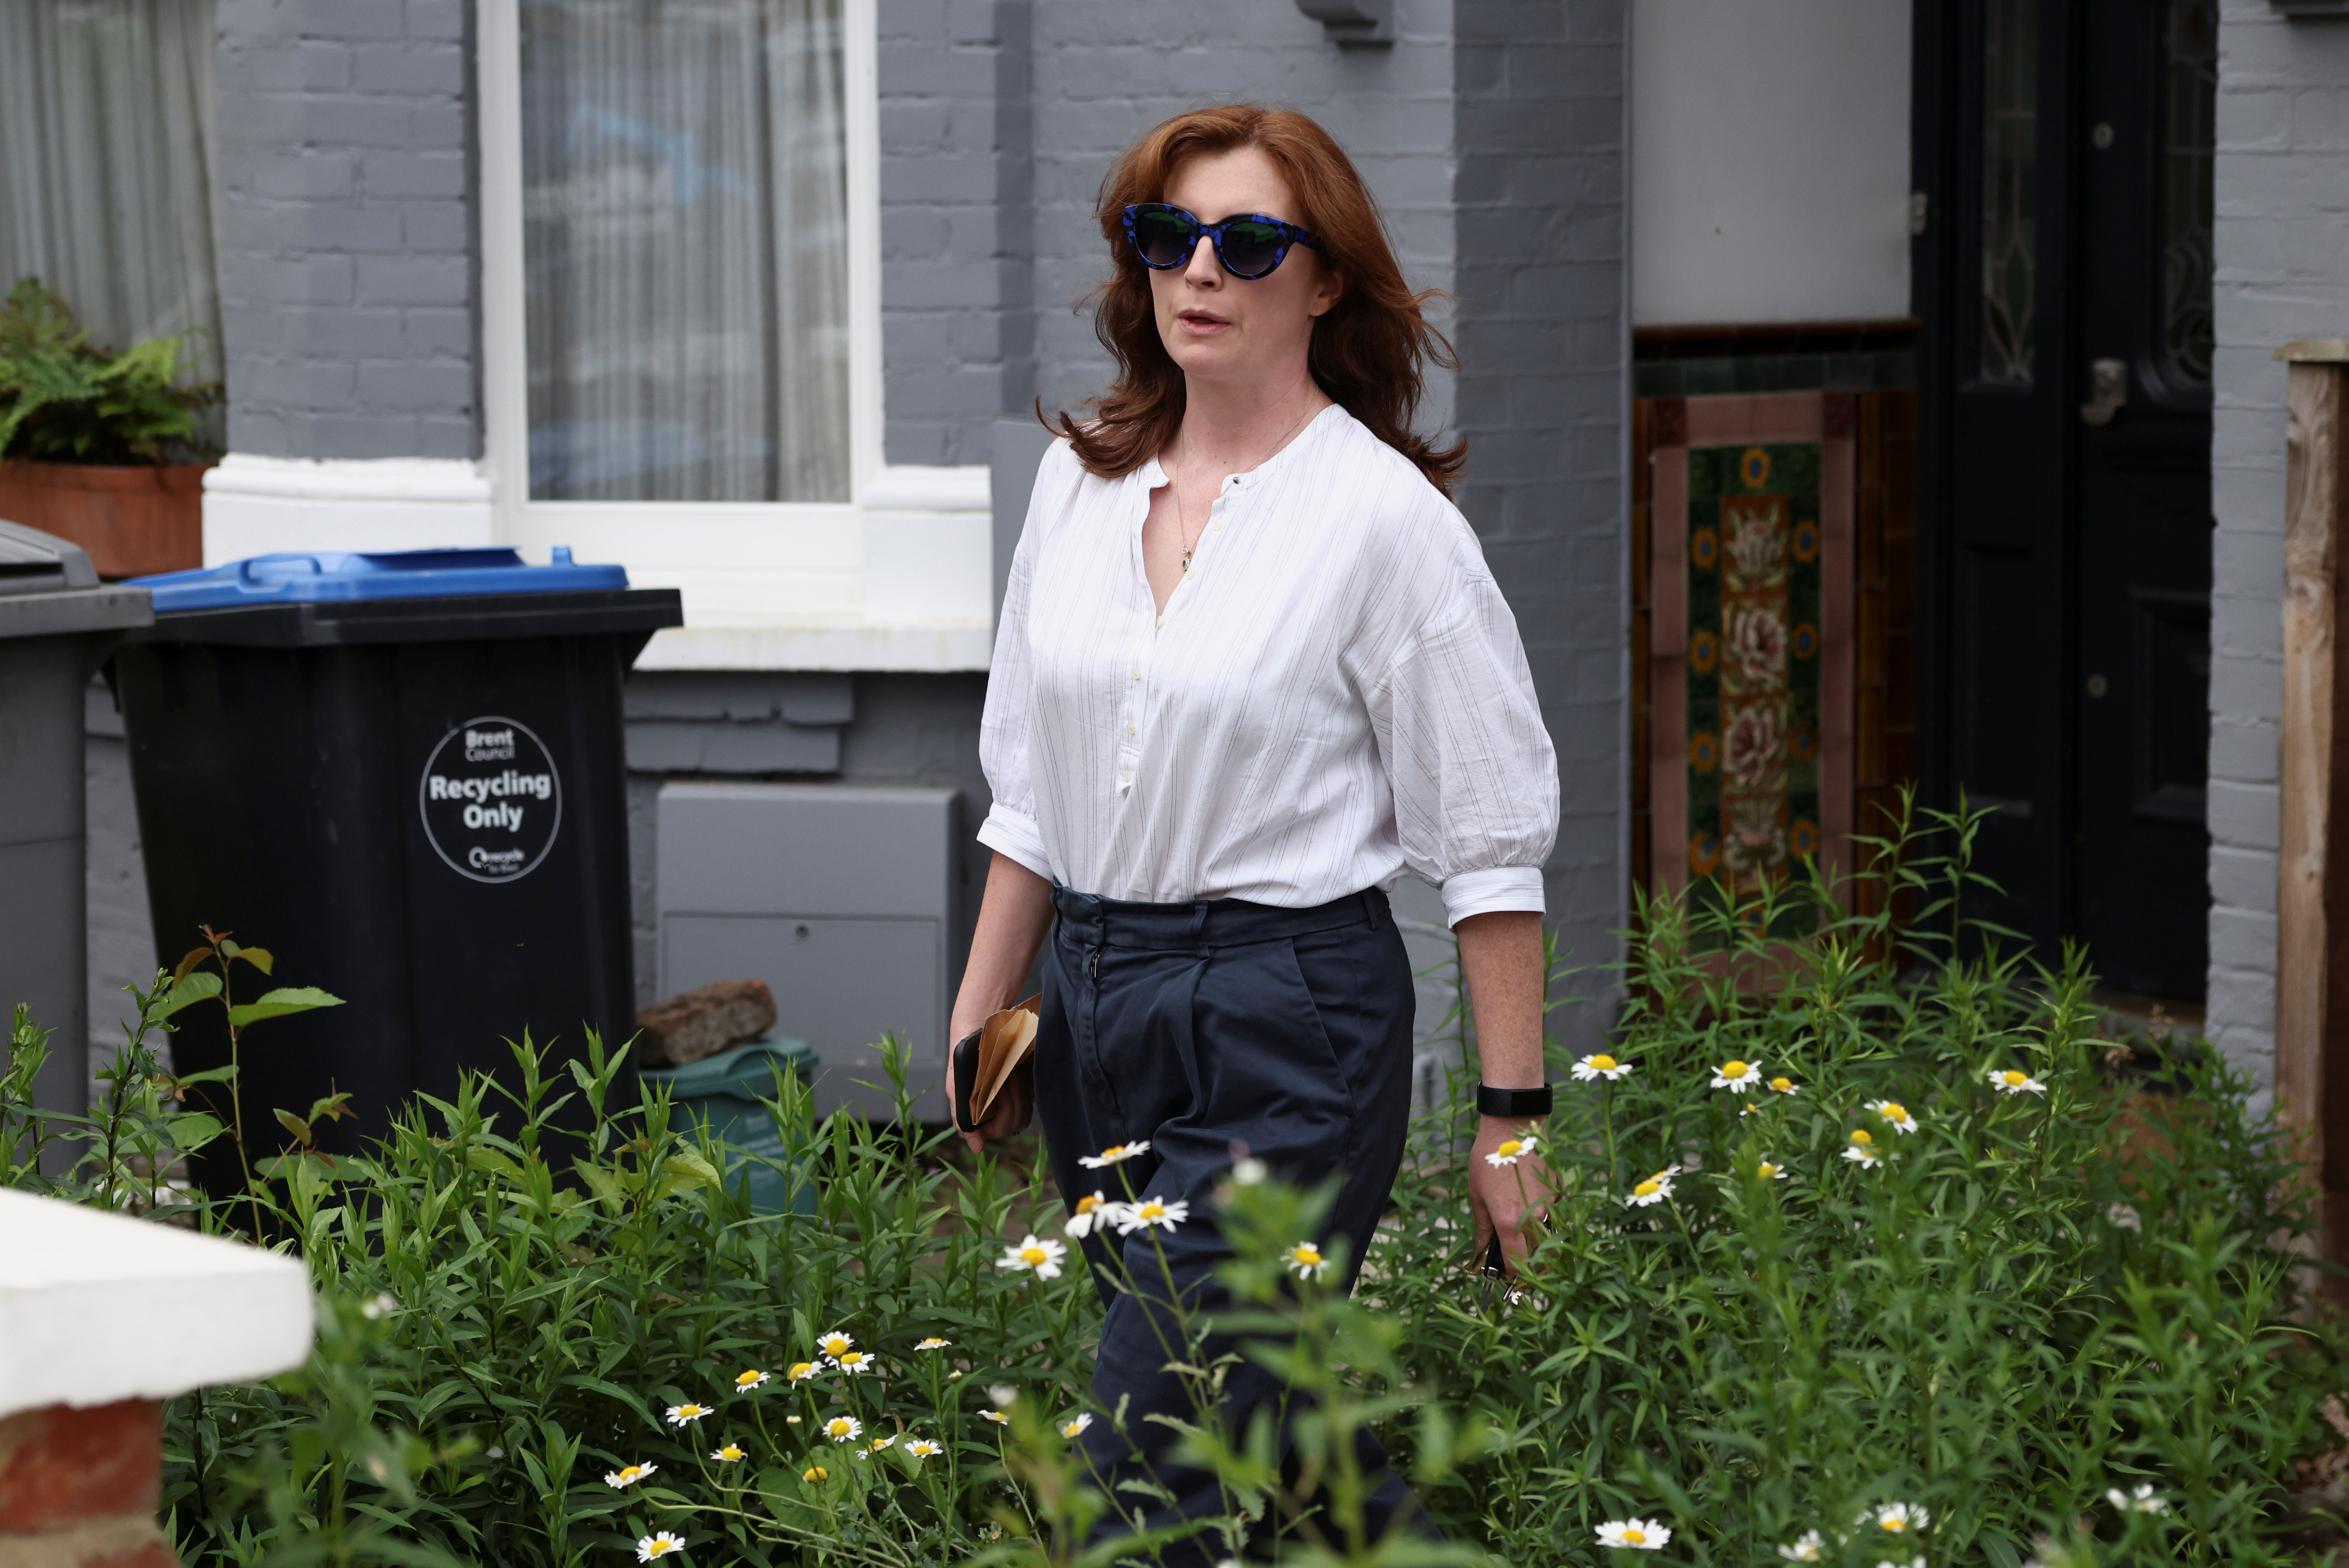 Martha Hancock, the wife of Britain's Health Secretary Matt Hancock, leaves her home in London, Britain, June 25, 2021. REUTERS/Henry Nicholls